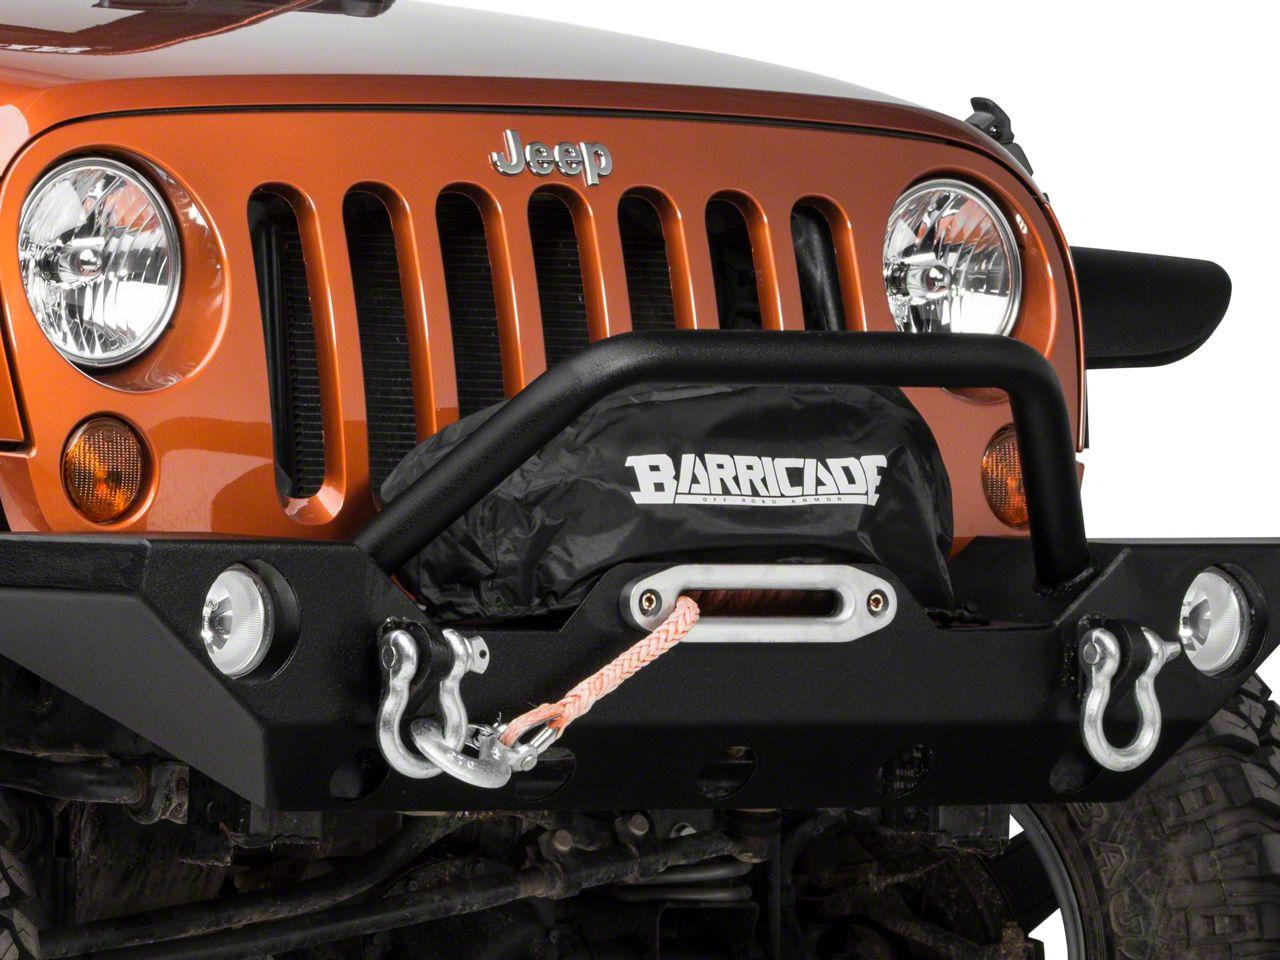 Barricade Winch Cover (87-19 Jeep Wrangler YJ, TJ, JK & JL)